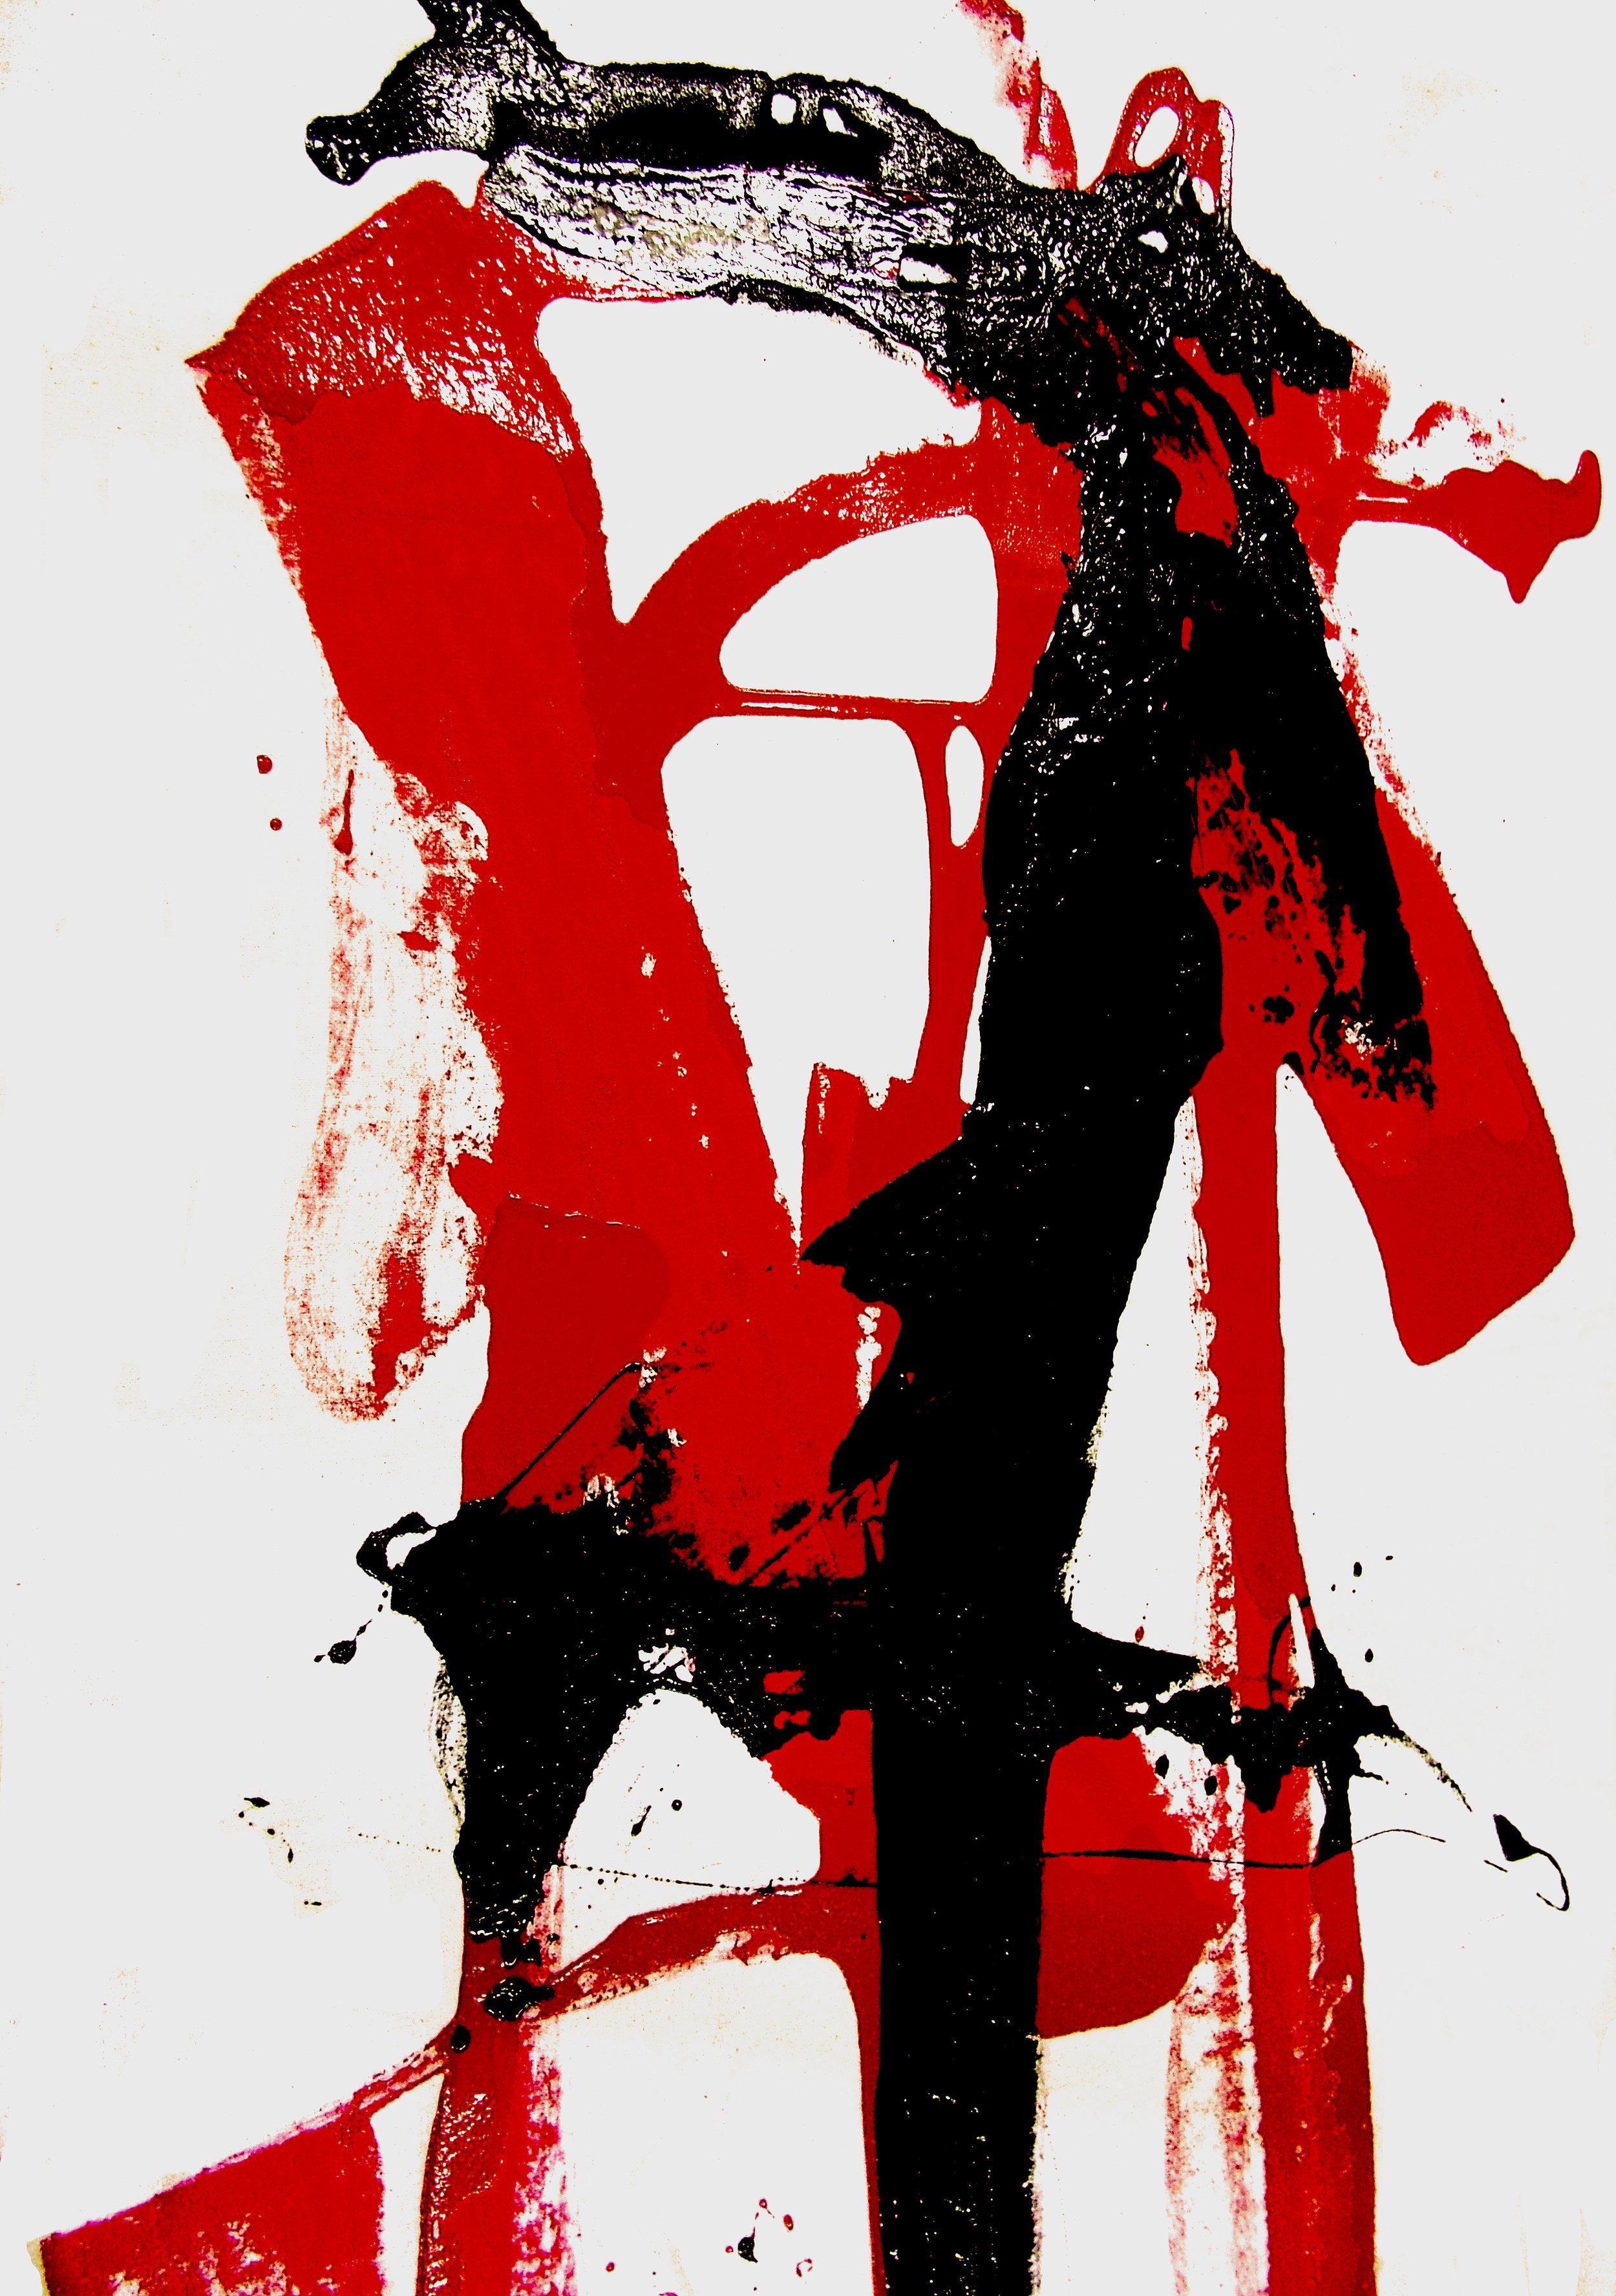 Red and black onCanvas copy.jpg